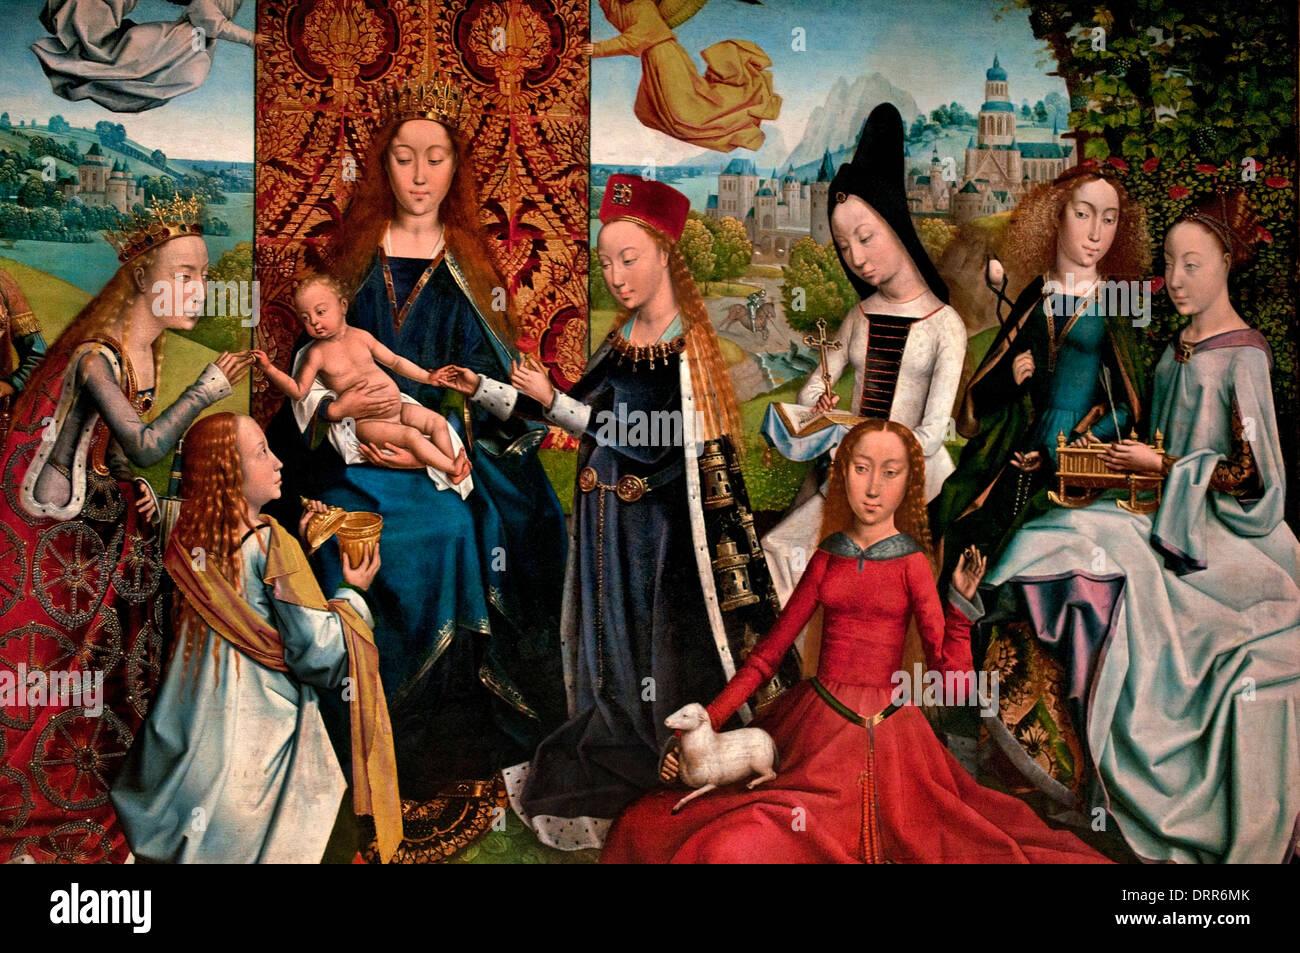 Virgins And Virginity Photos Jpg